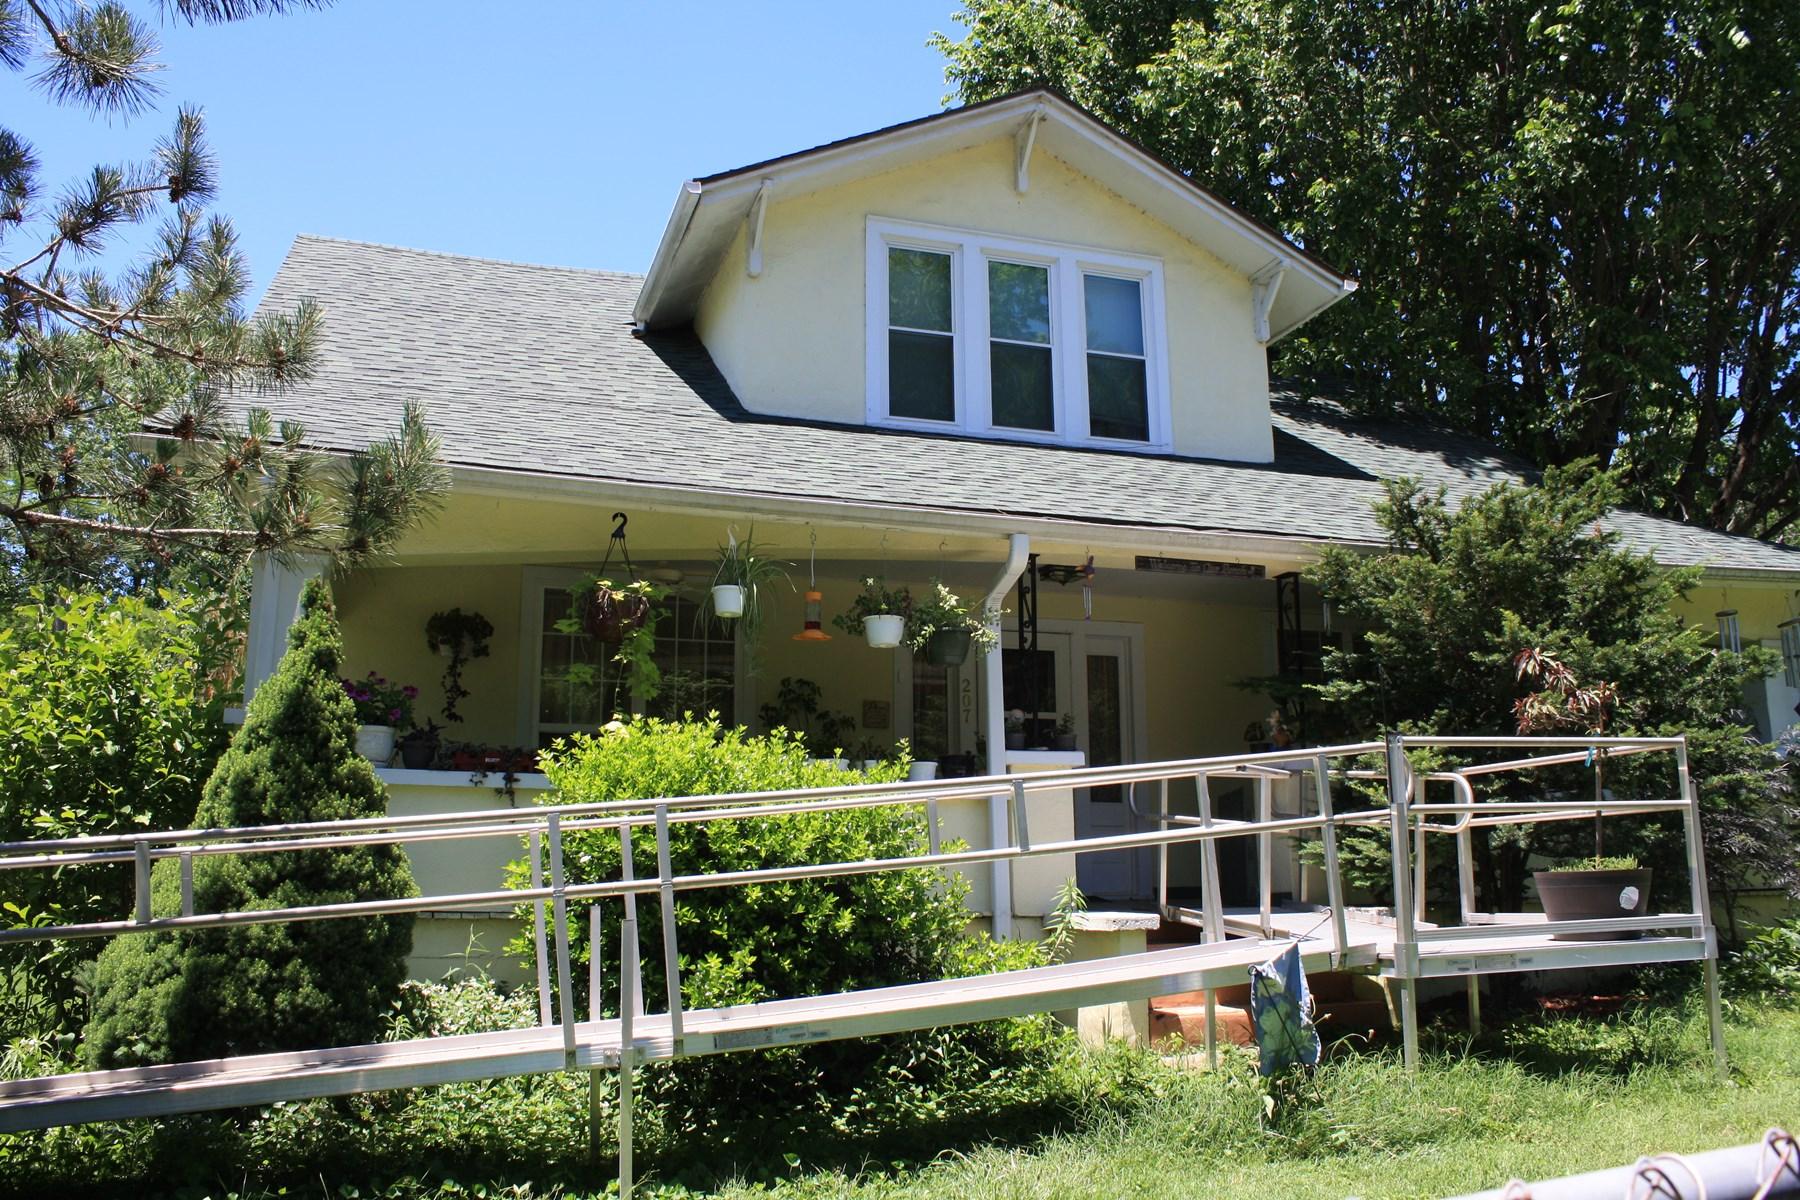 Wayne County MO Historic Home for sale